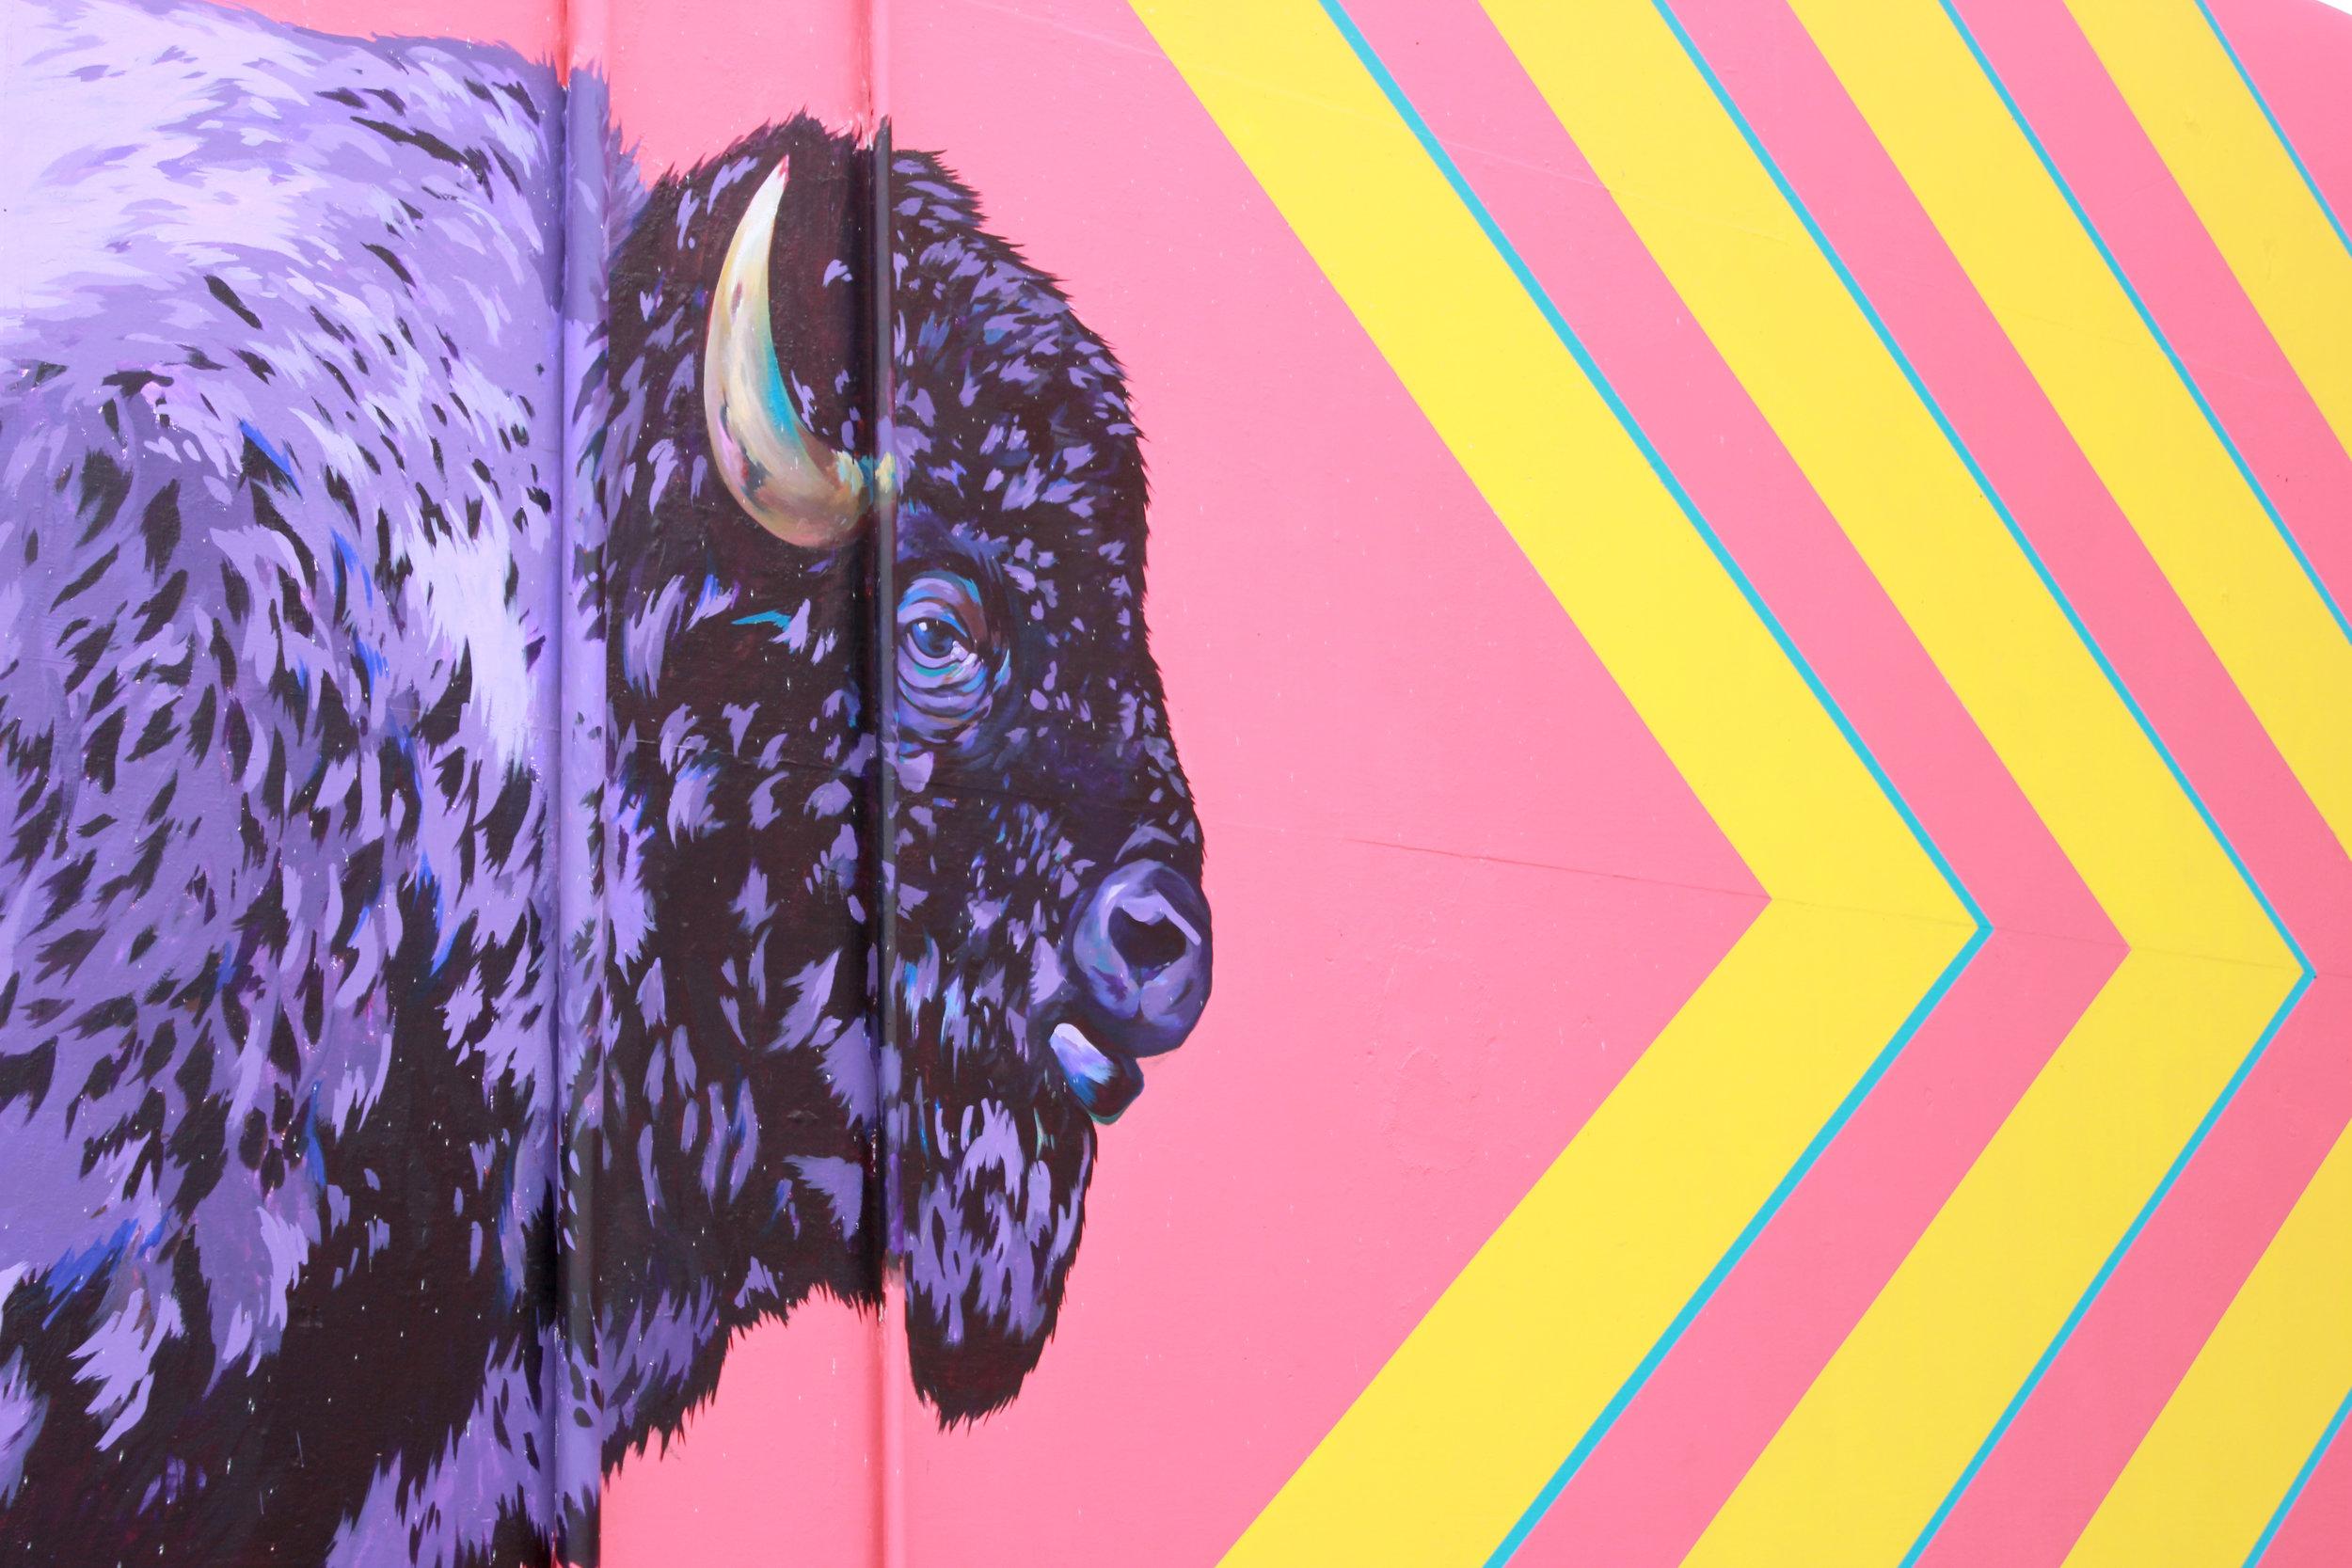 Alameda-Point-Murals-Buffalo.jpg